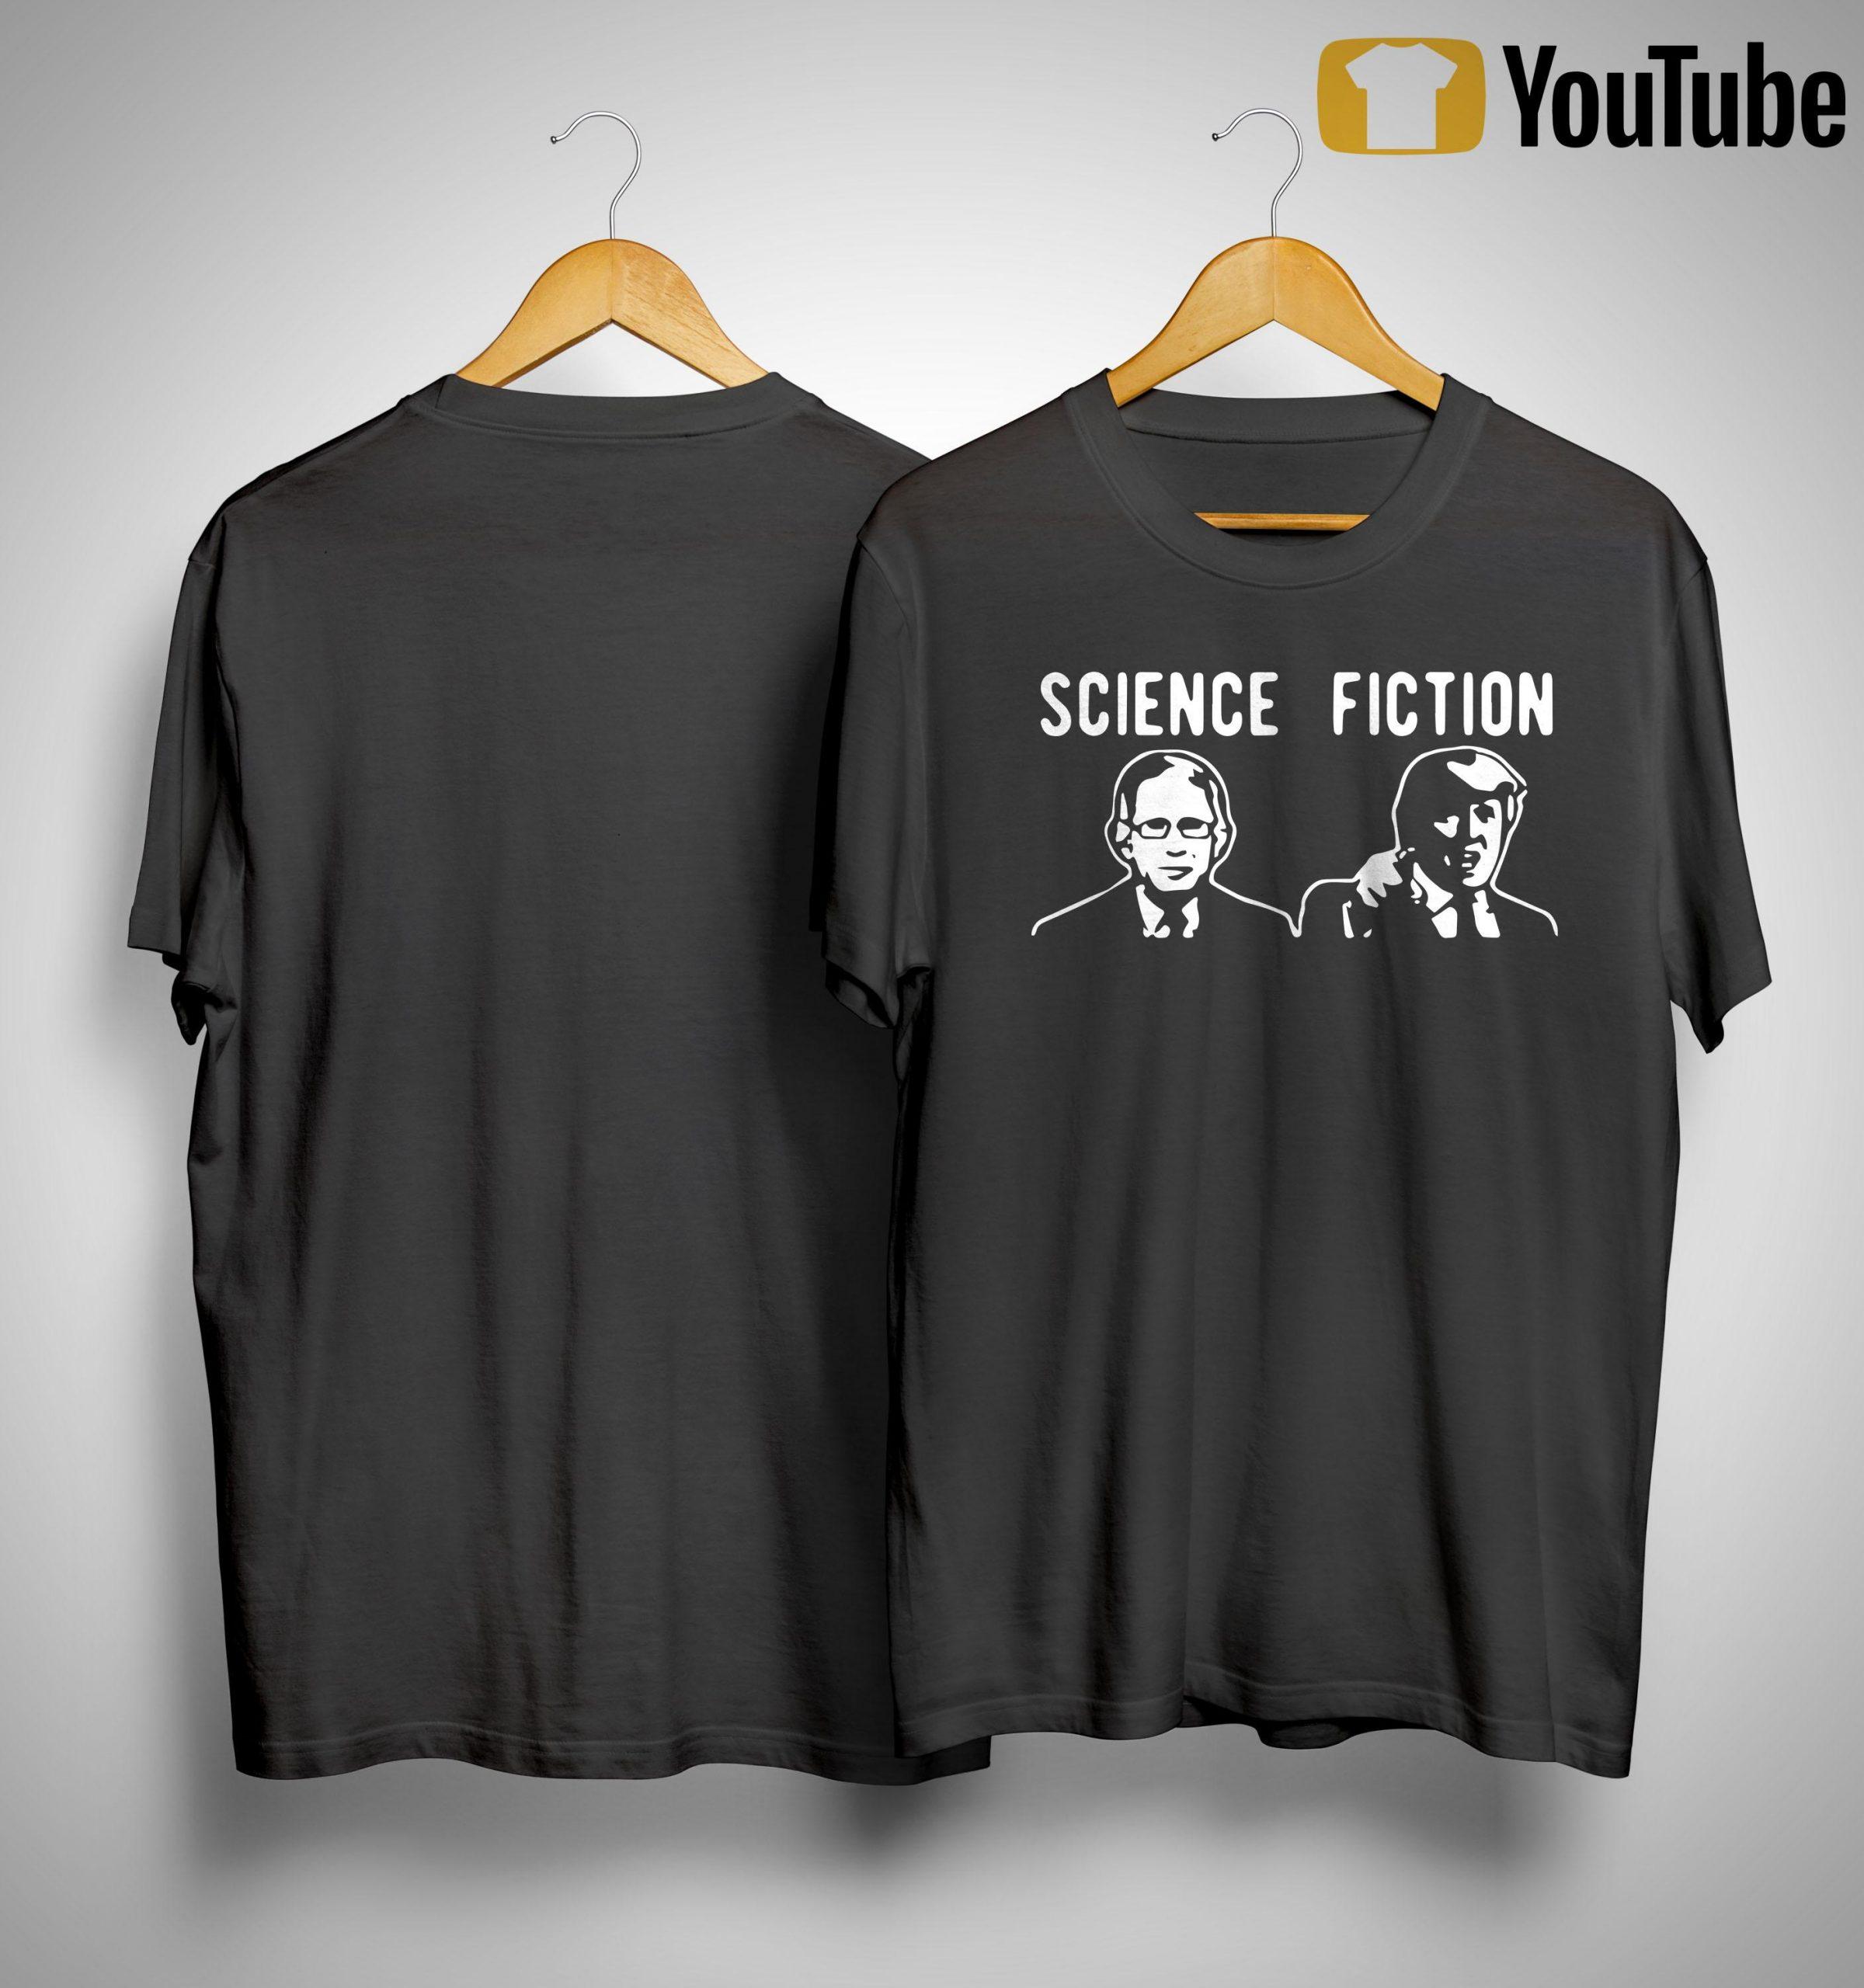 Fauci Vs Trump Science Fiction Shirt